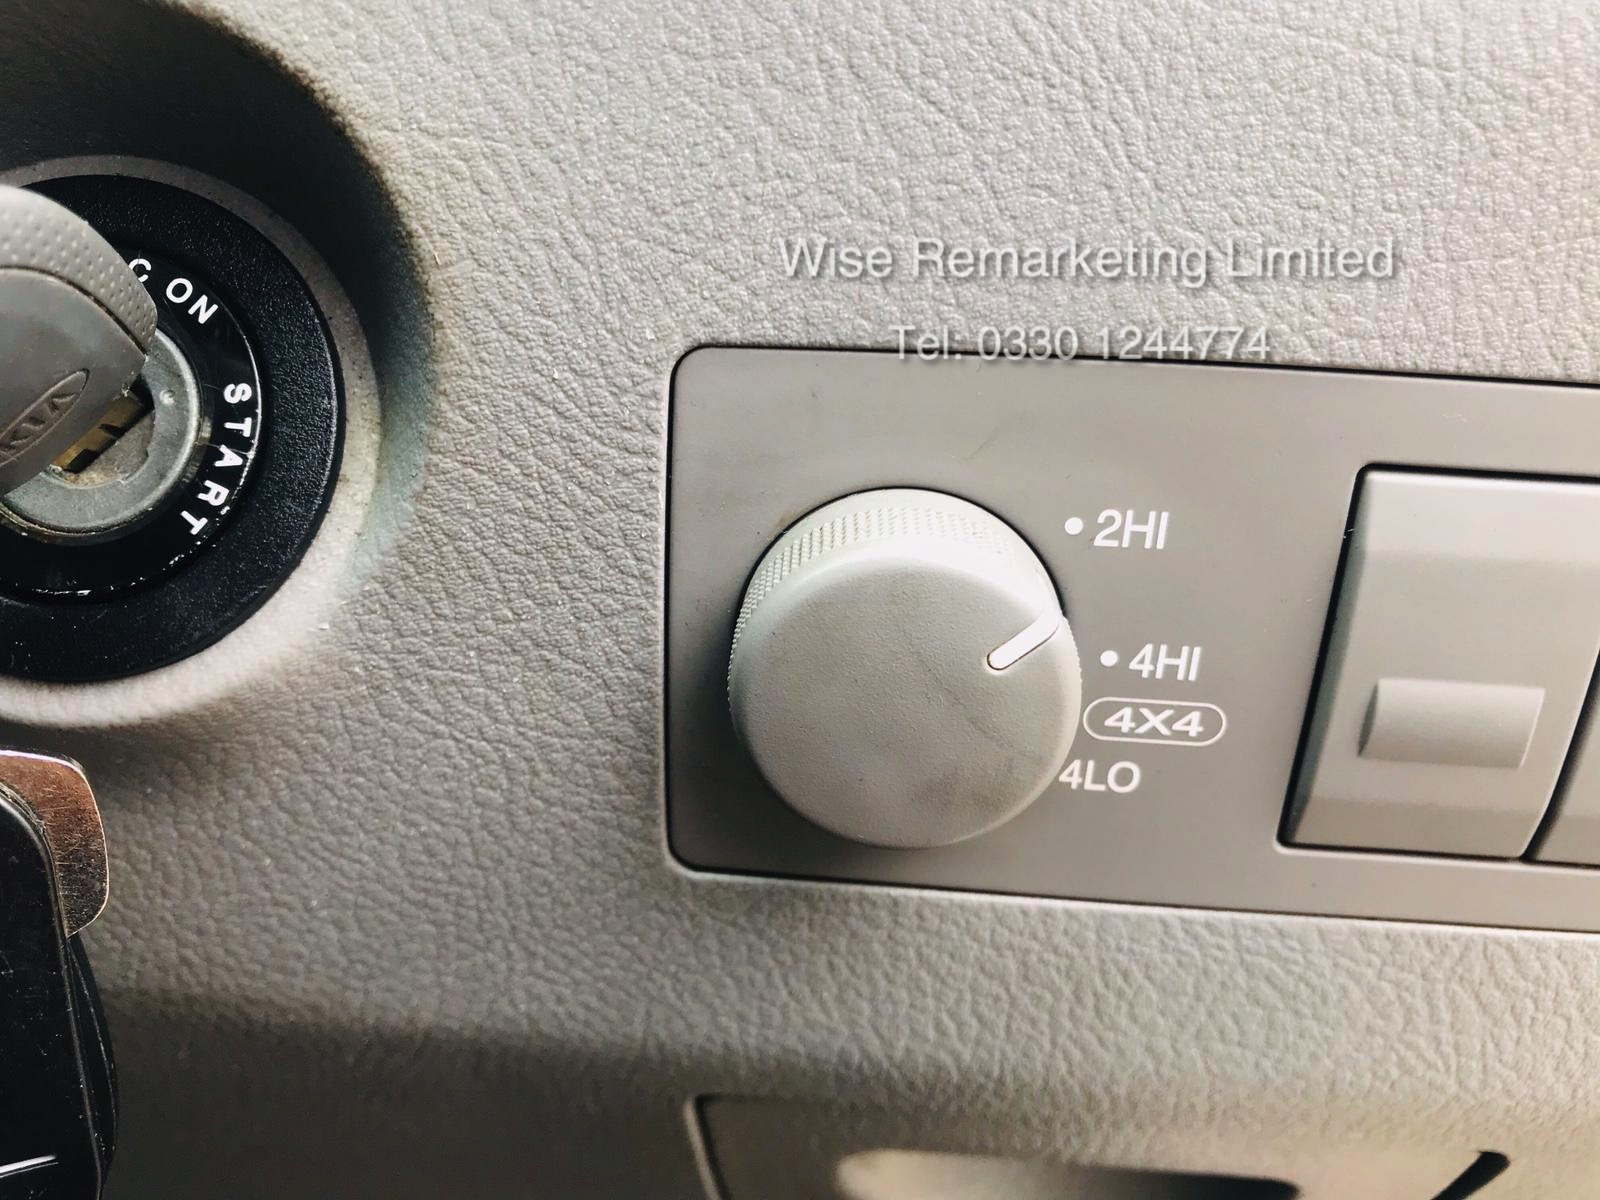 KIA Sorento 2.5 CRDI XE Model (138 BHP) - 2006 06 Reg - 4X4 - Air Con - - Image 23 of 24